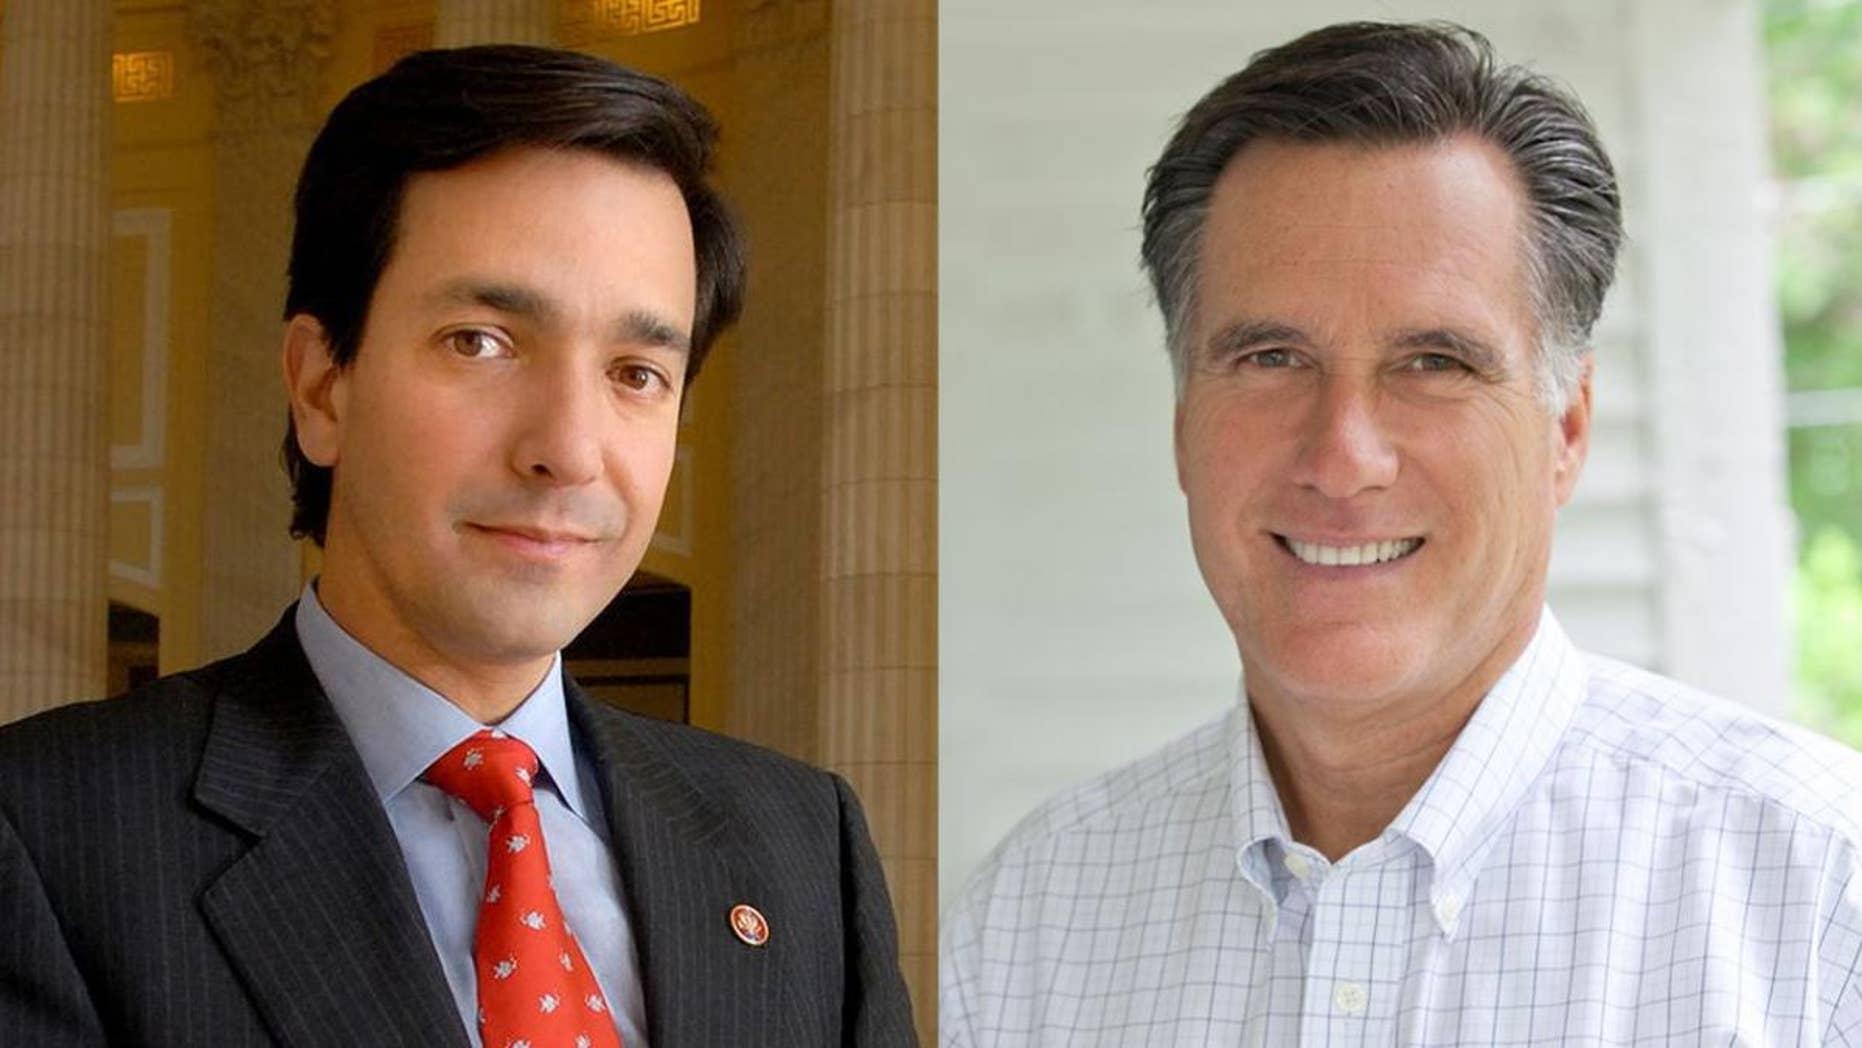 Luis Fortuno/Mitt Romney